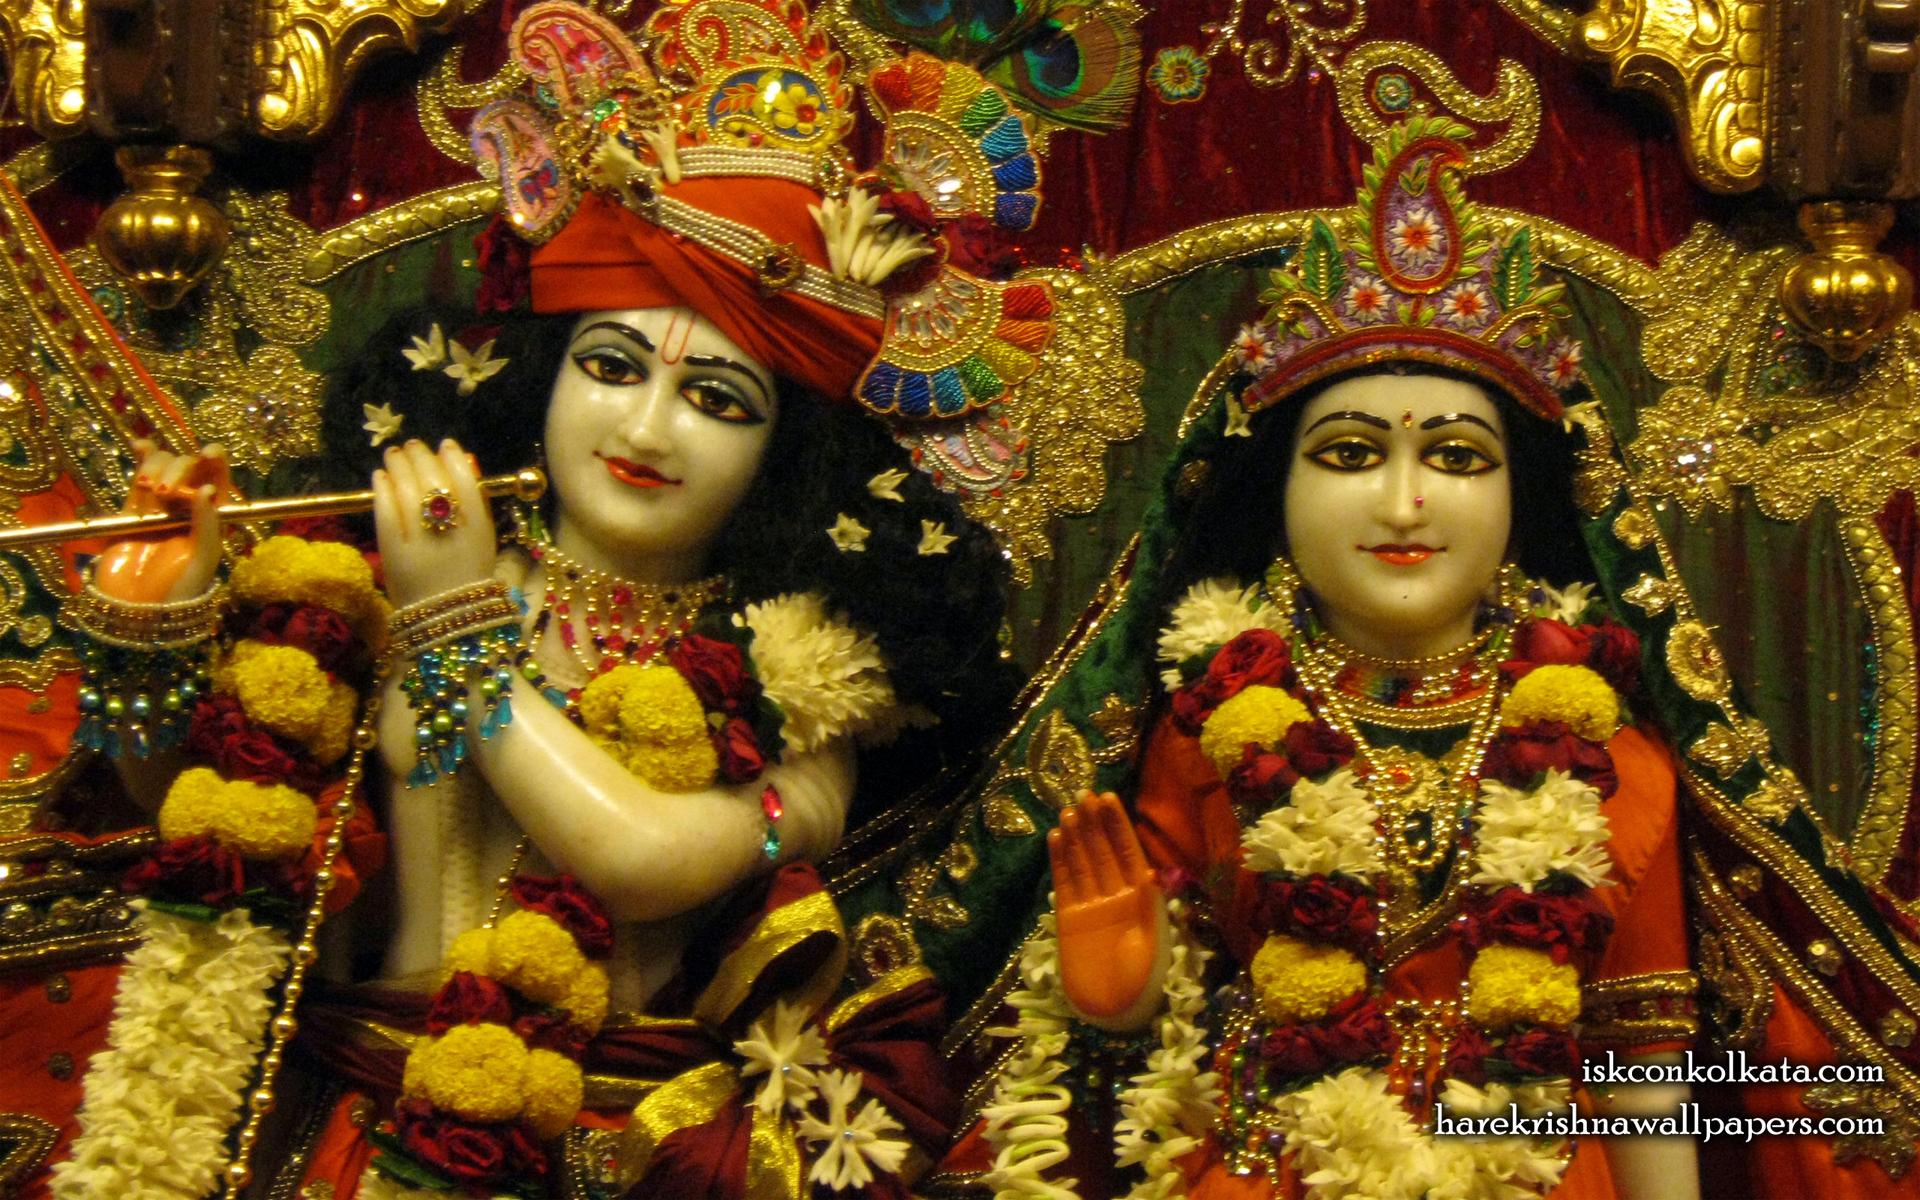 Sri Sri Radha Govinda Close up Wallpaper (002) Size 1920x1200 Download